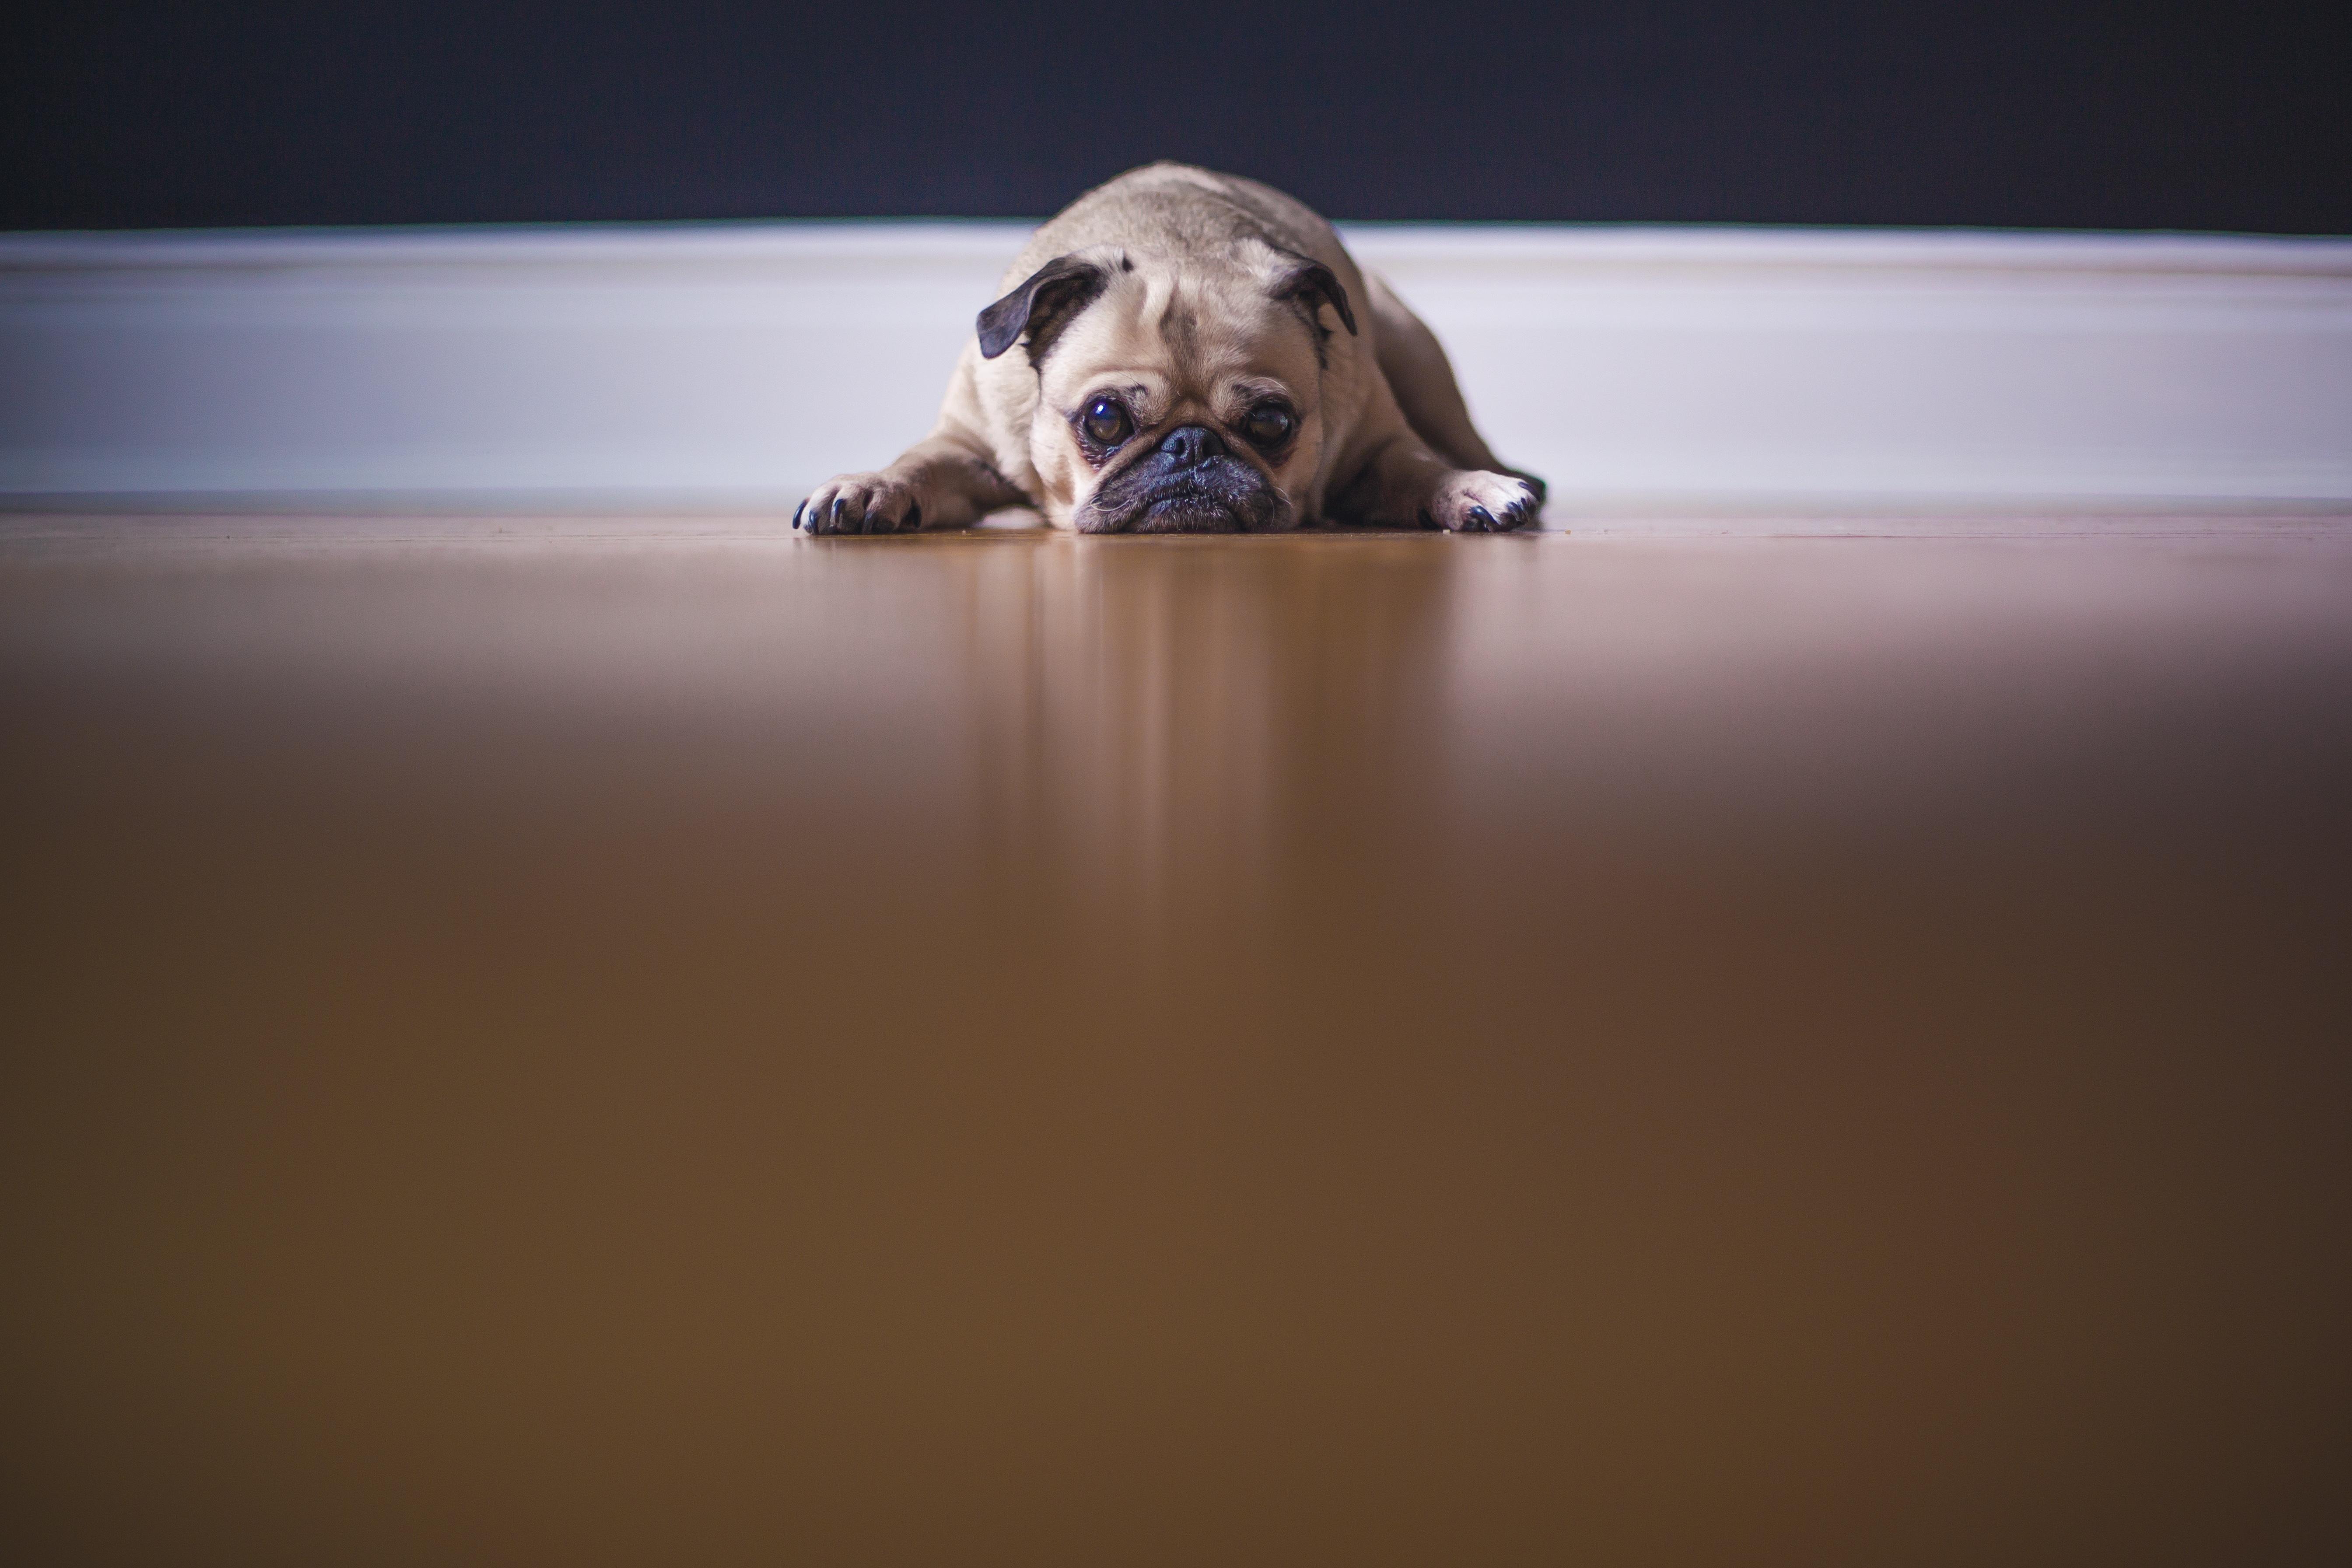 Dog, Lying, Pet, Lye, Favorite, HQ Photo